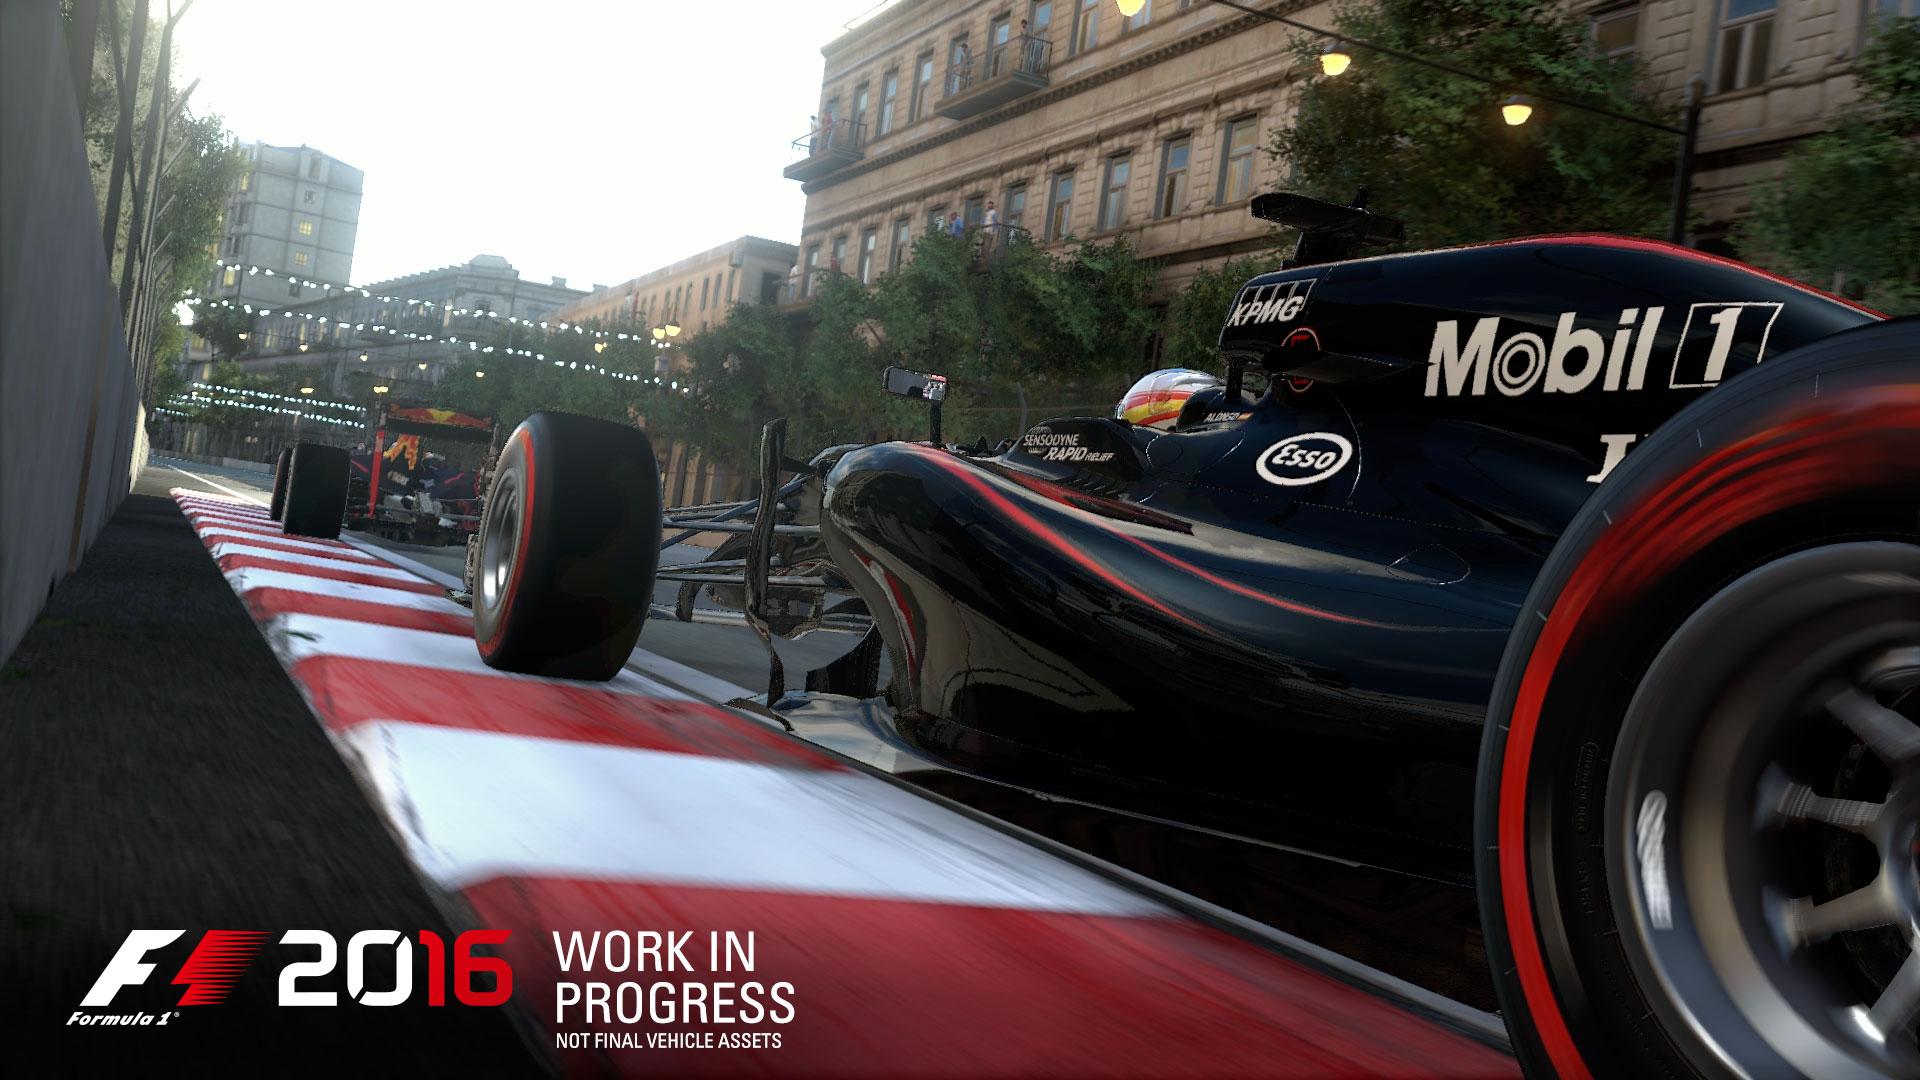 F1 201698 f1 2016 f1 2016 f1 2016 voltagebd Choice Image